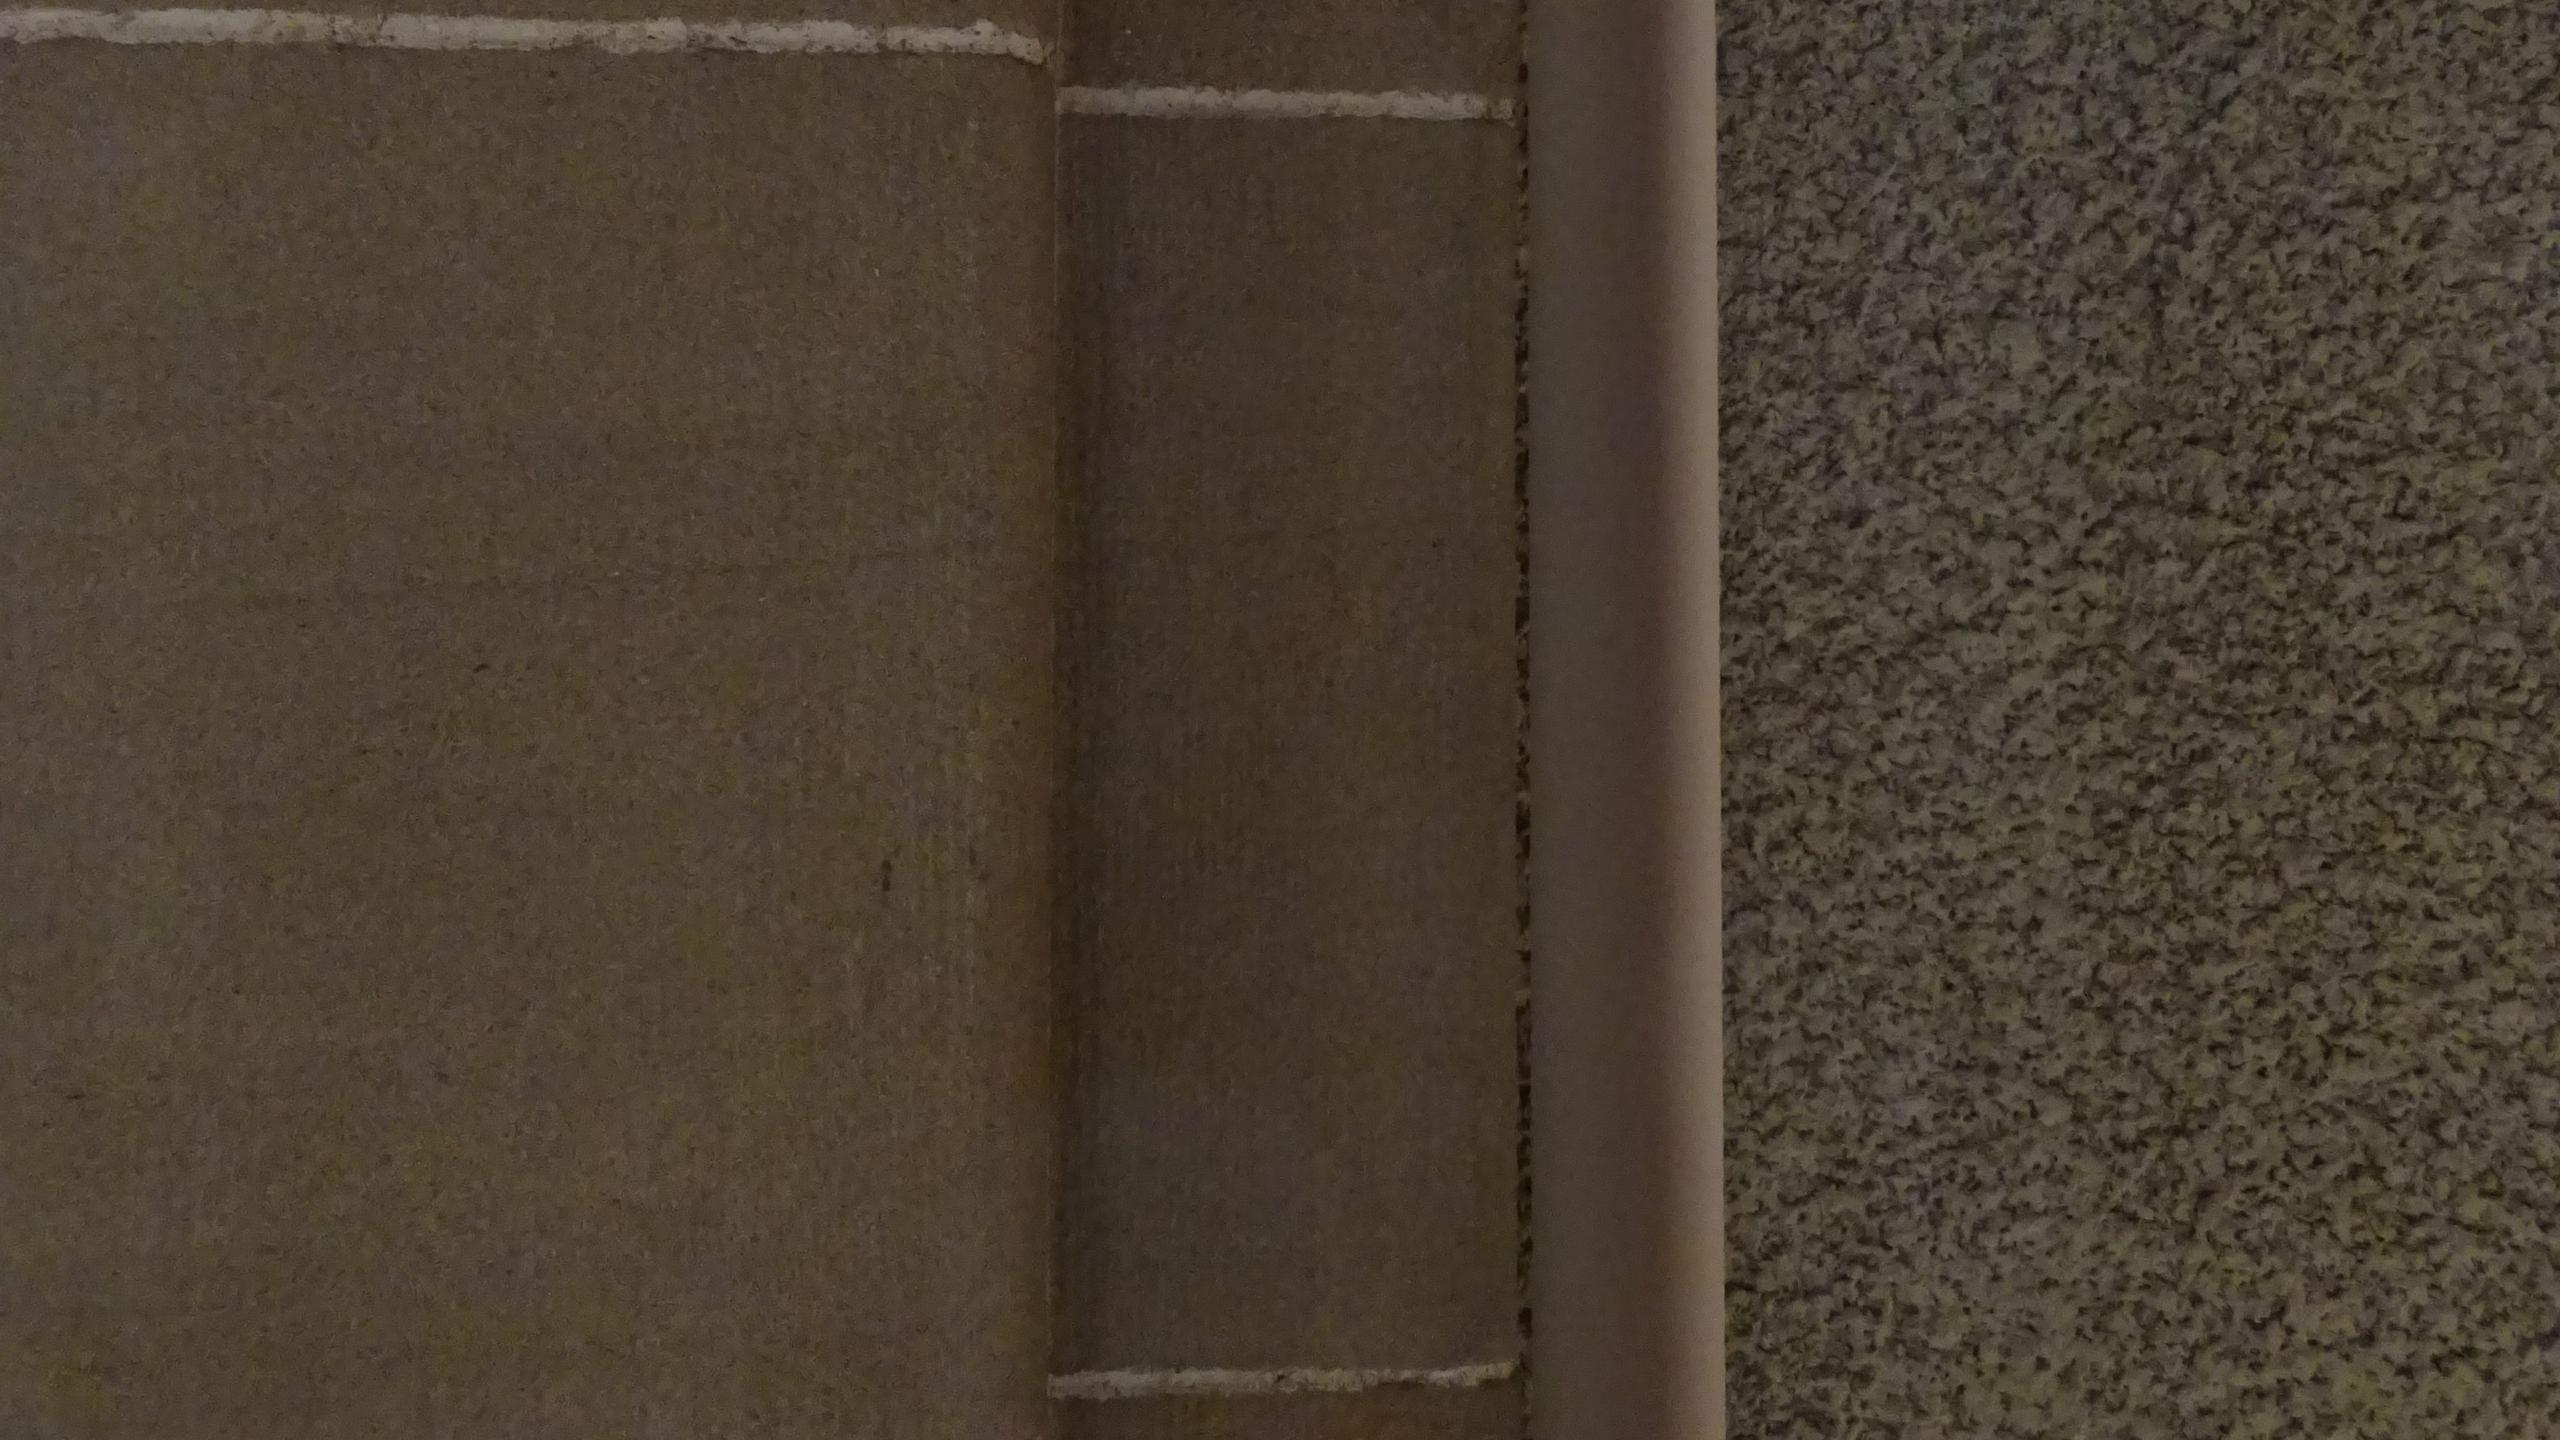 Kamera Dirigenten Monitor Farbanpassung Tube